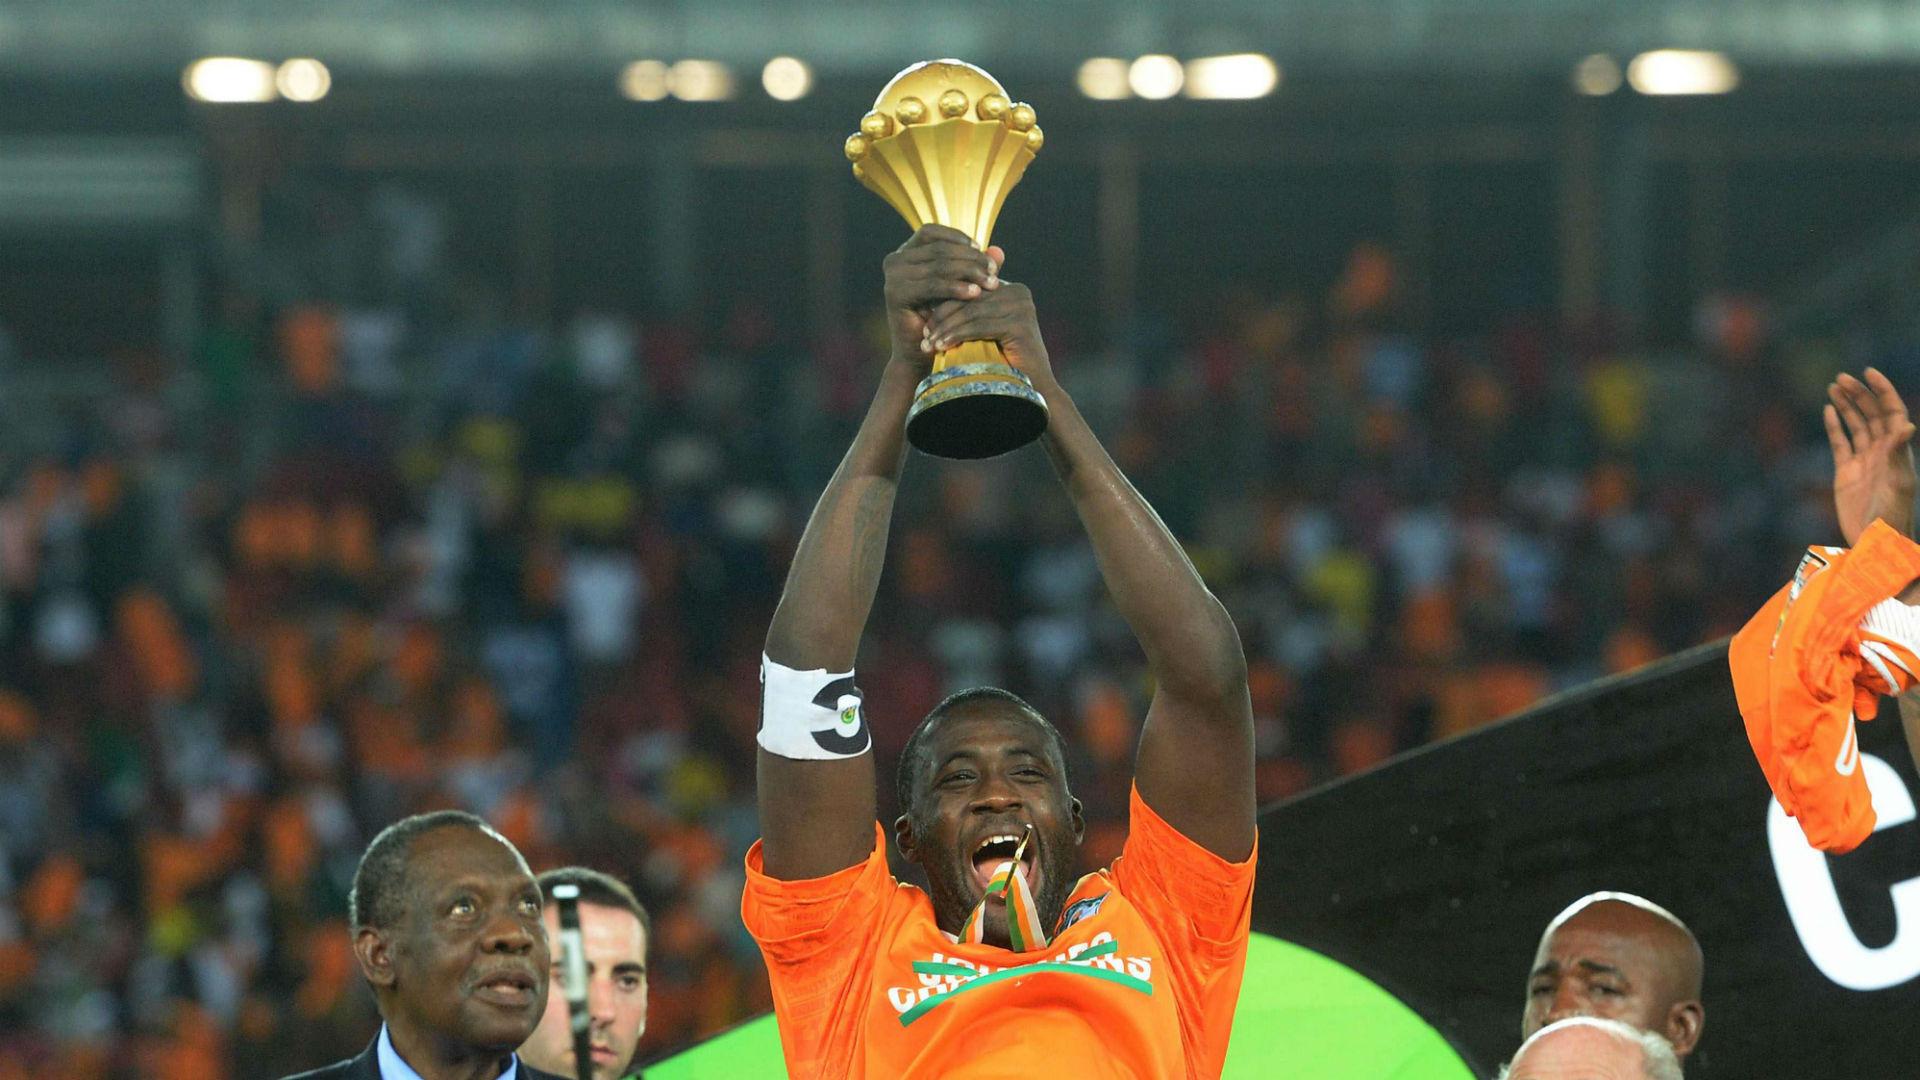 2019 AFCON: Former Ivory Coast captain Yaya Toure backs Cameroon to qualify ahead of Ghana